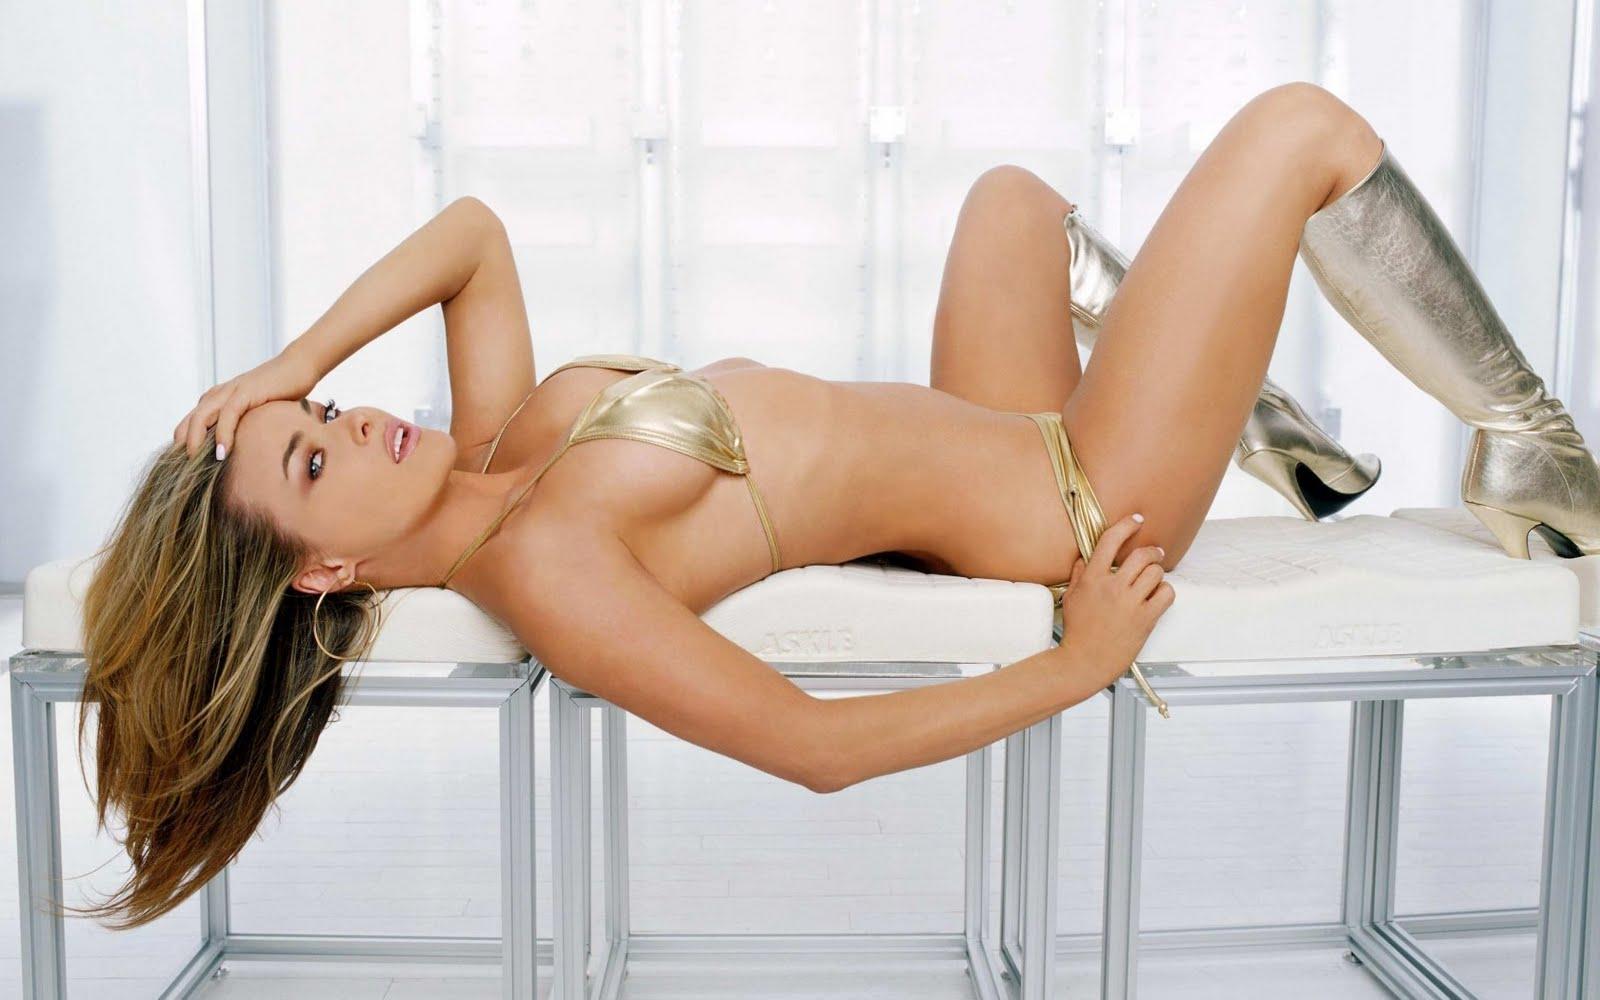 Hollywood Stars Carmen Electra Hot Wallpapers 2012